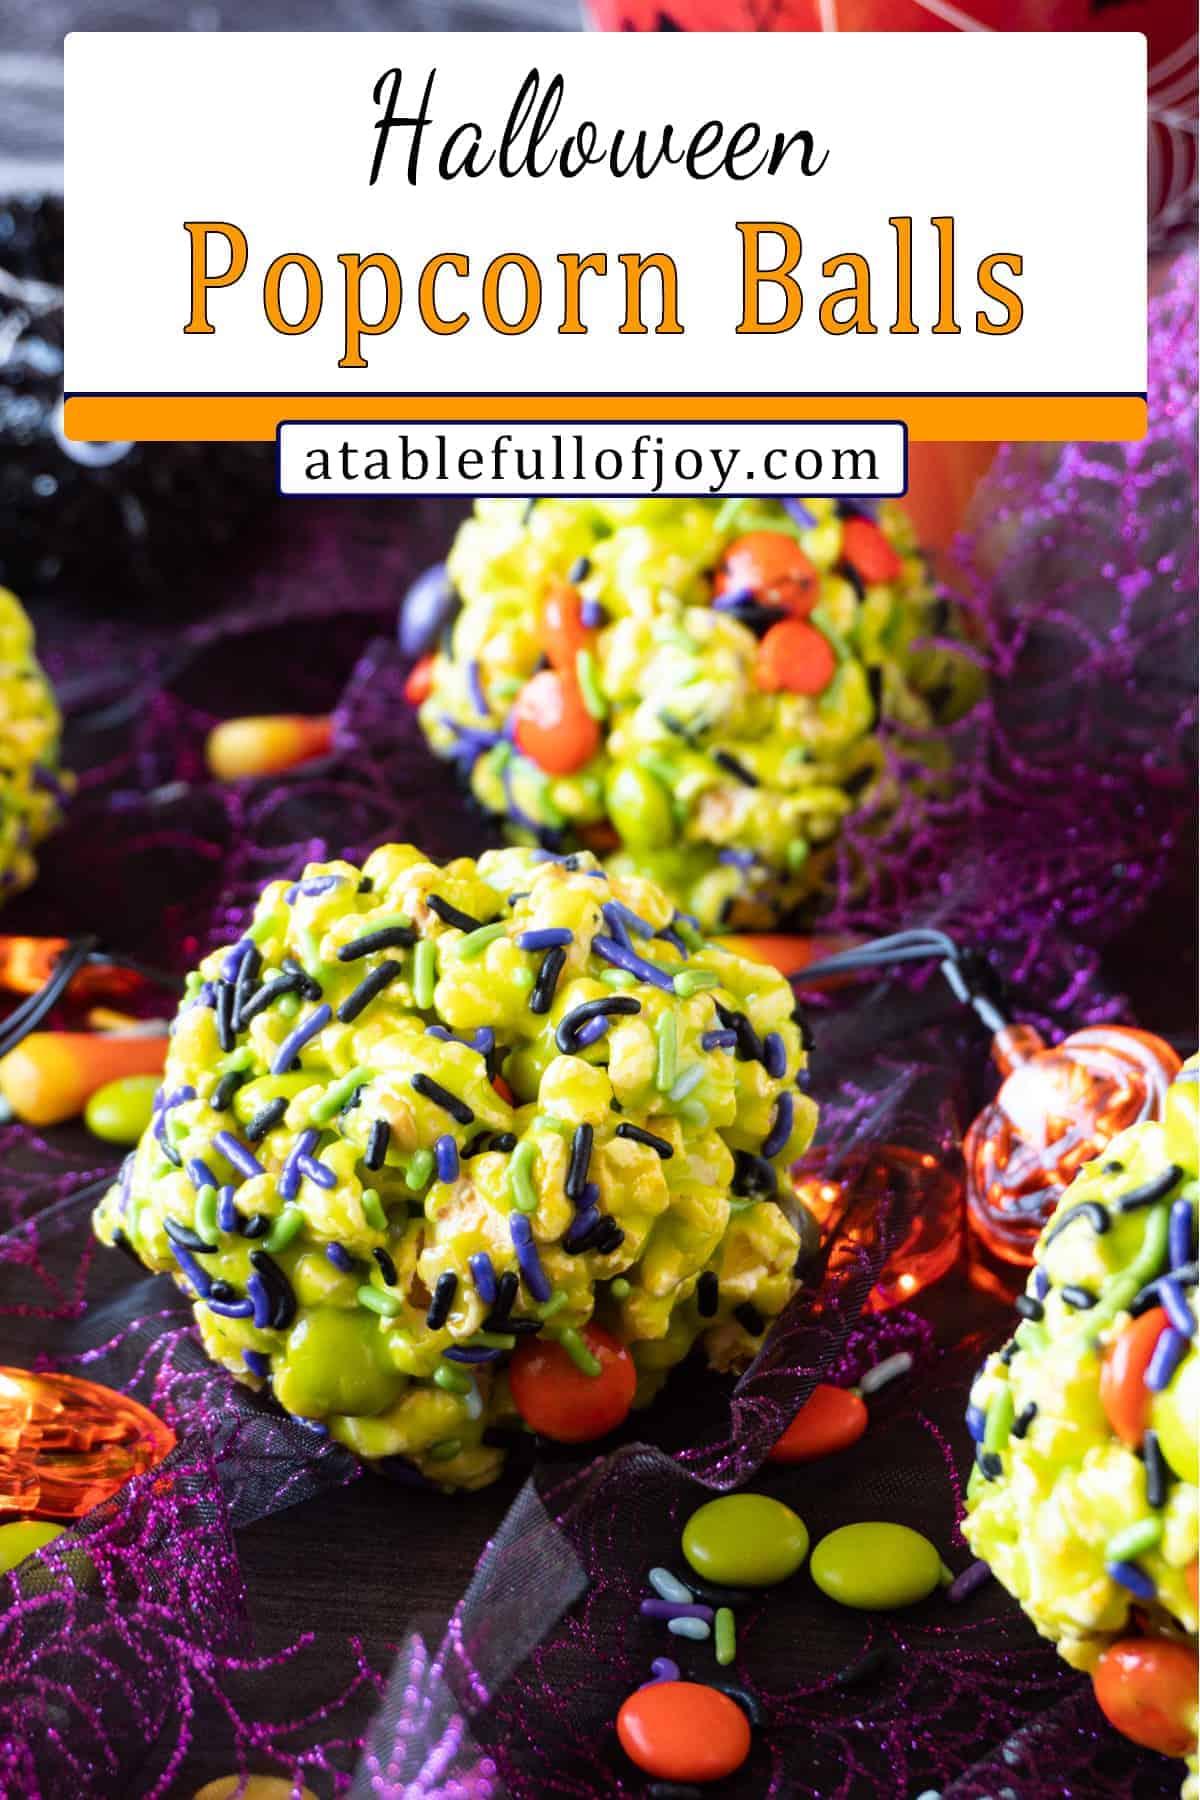 popcorn balls pinterest pin